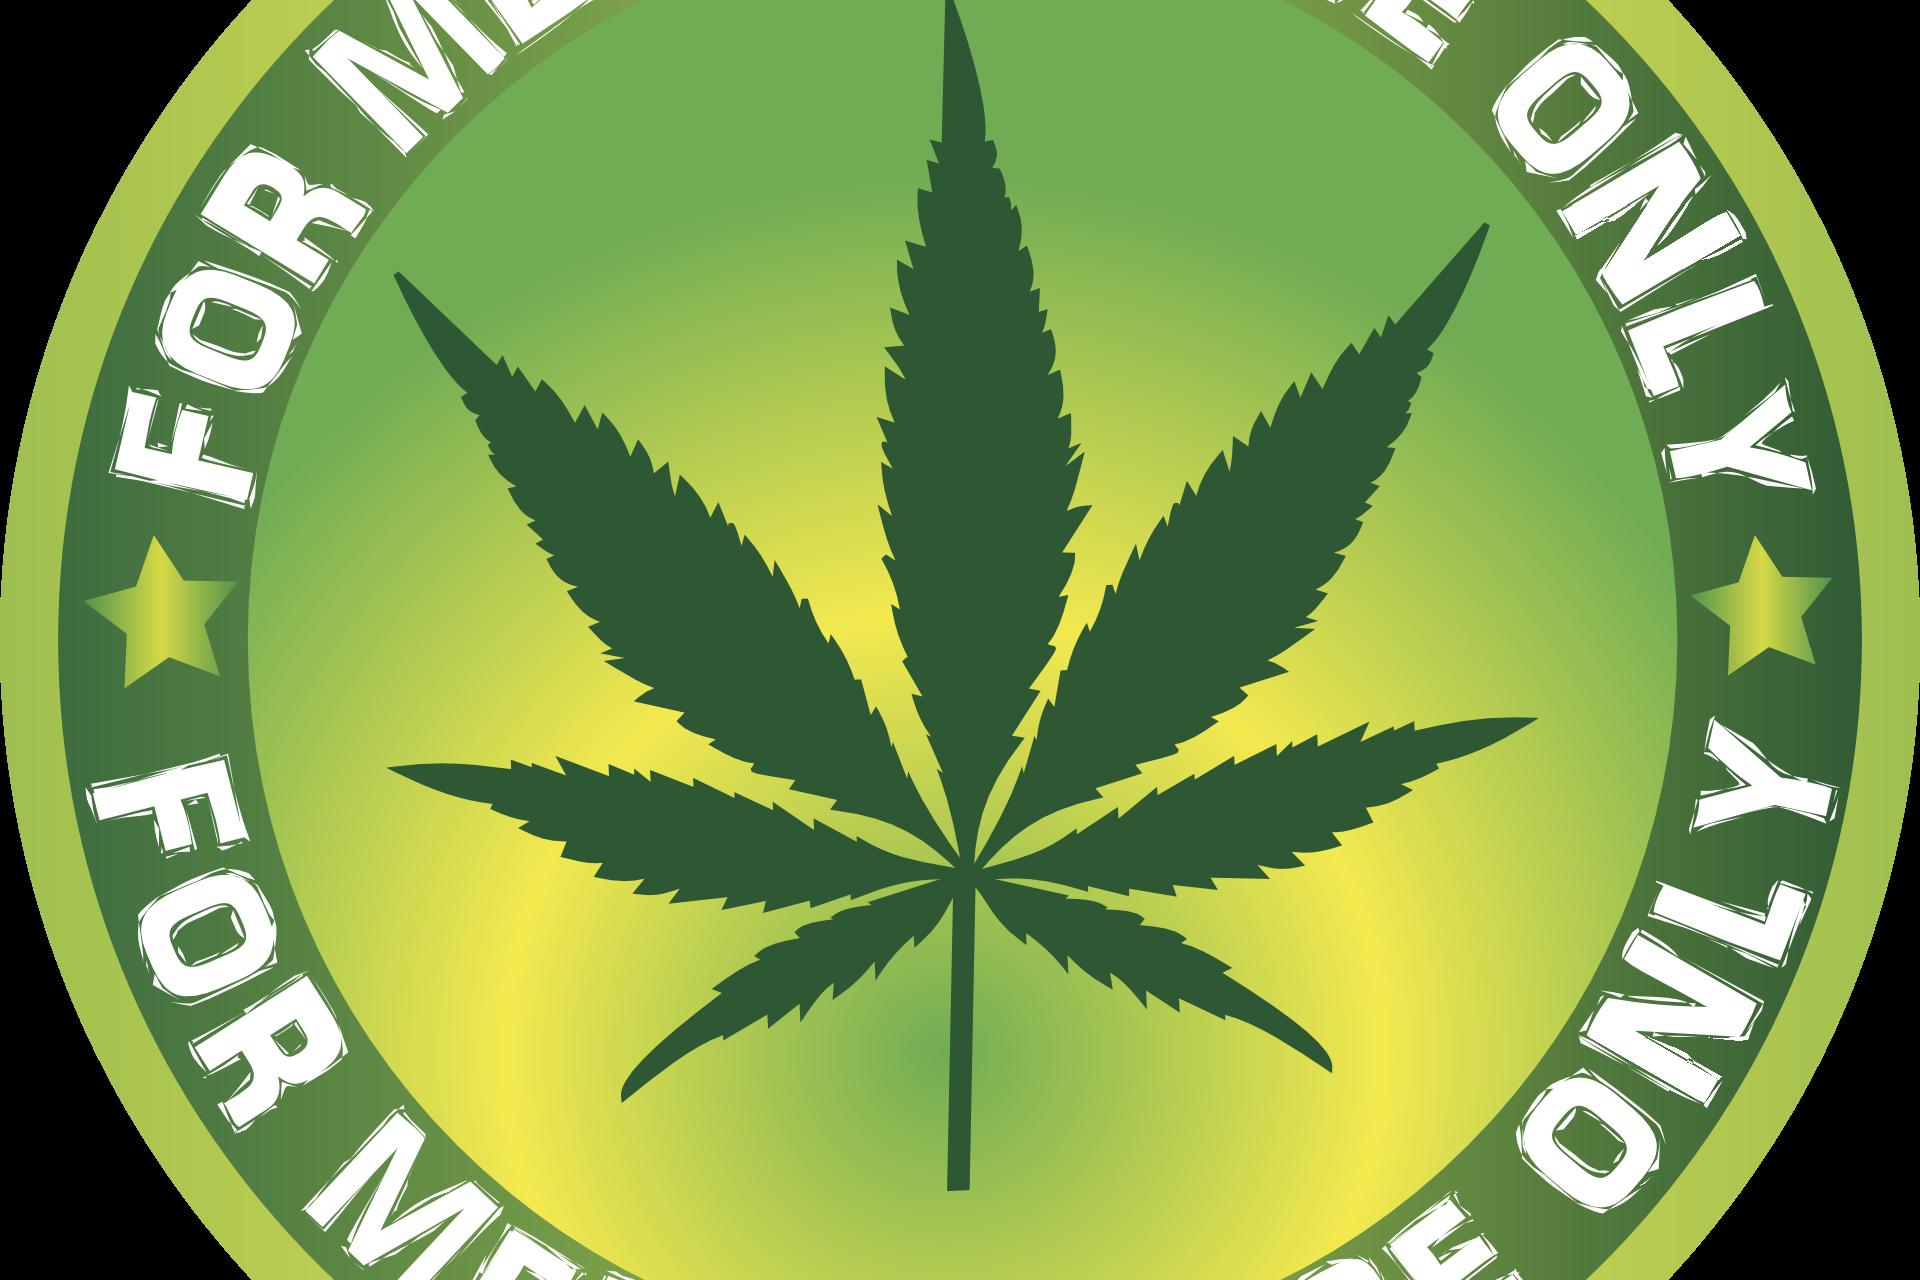 Medical oxymoron or the. Marijuana clipart illegal